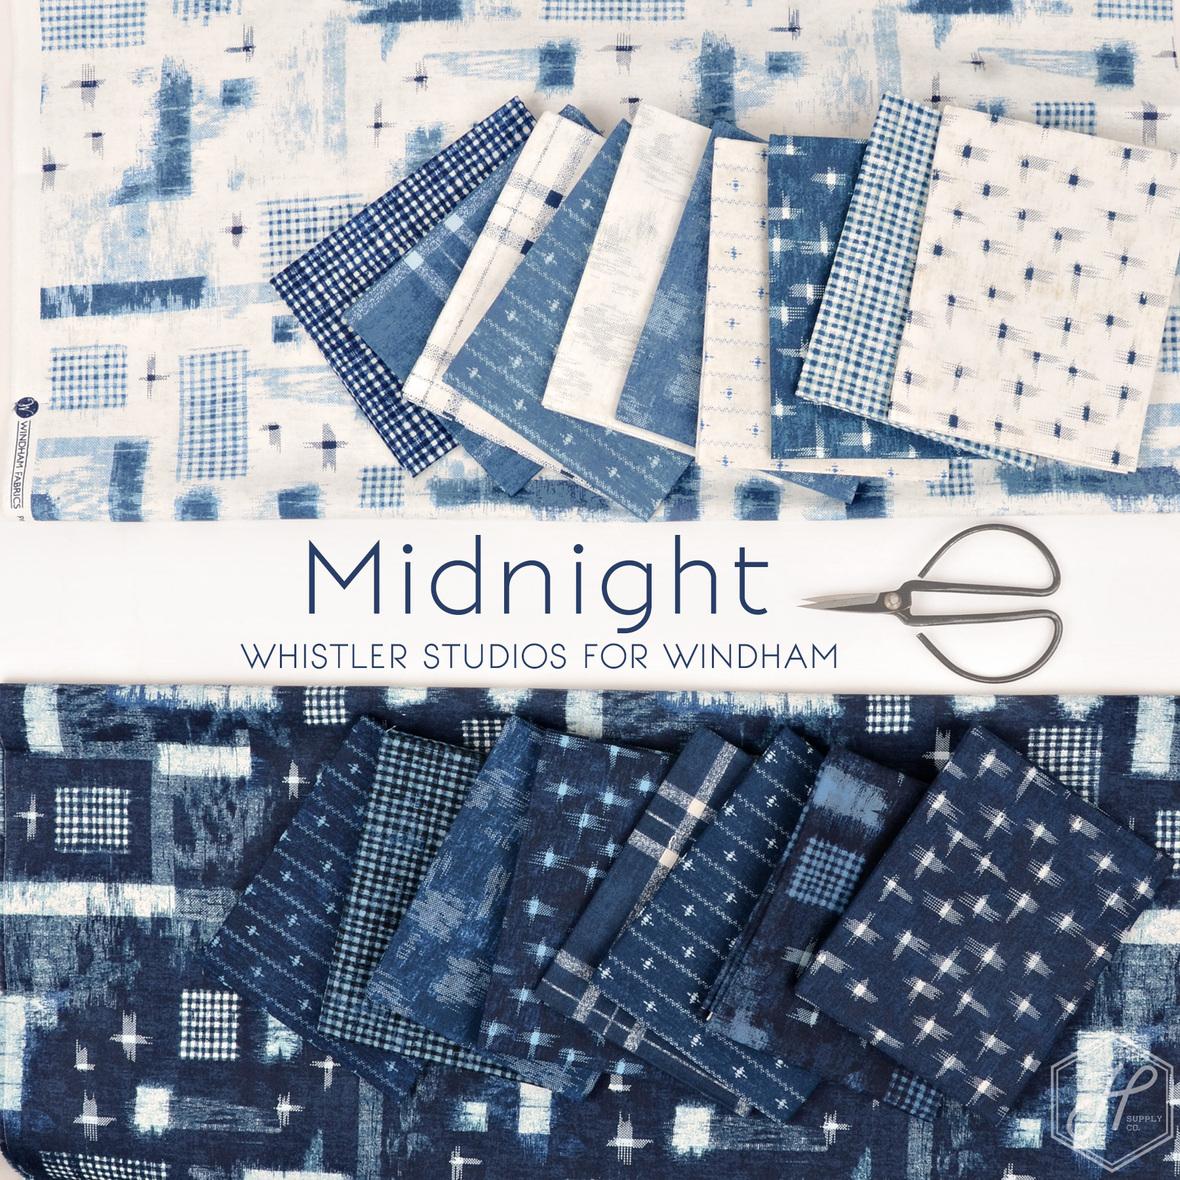 Midnight Whistler Studios for Windham at Hawtorne Supply Co indigo fabric